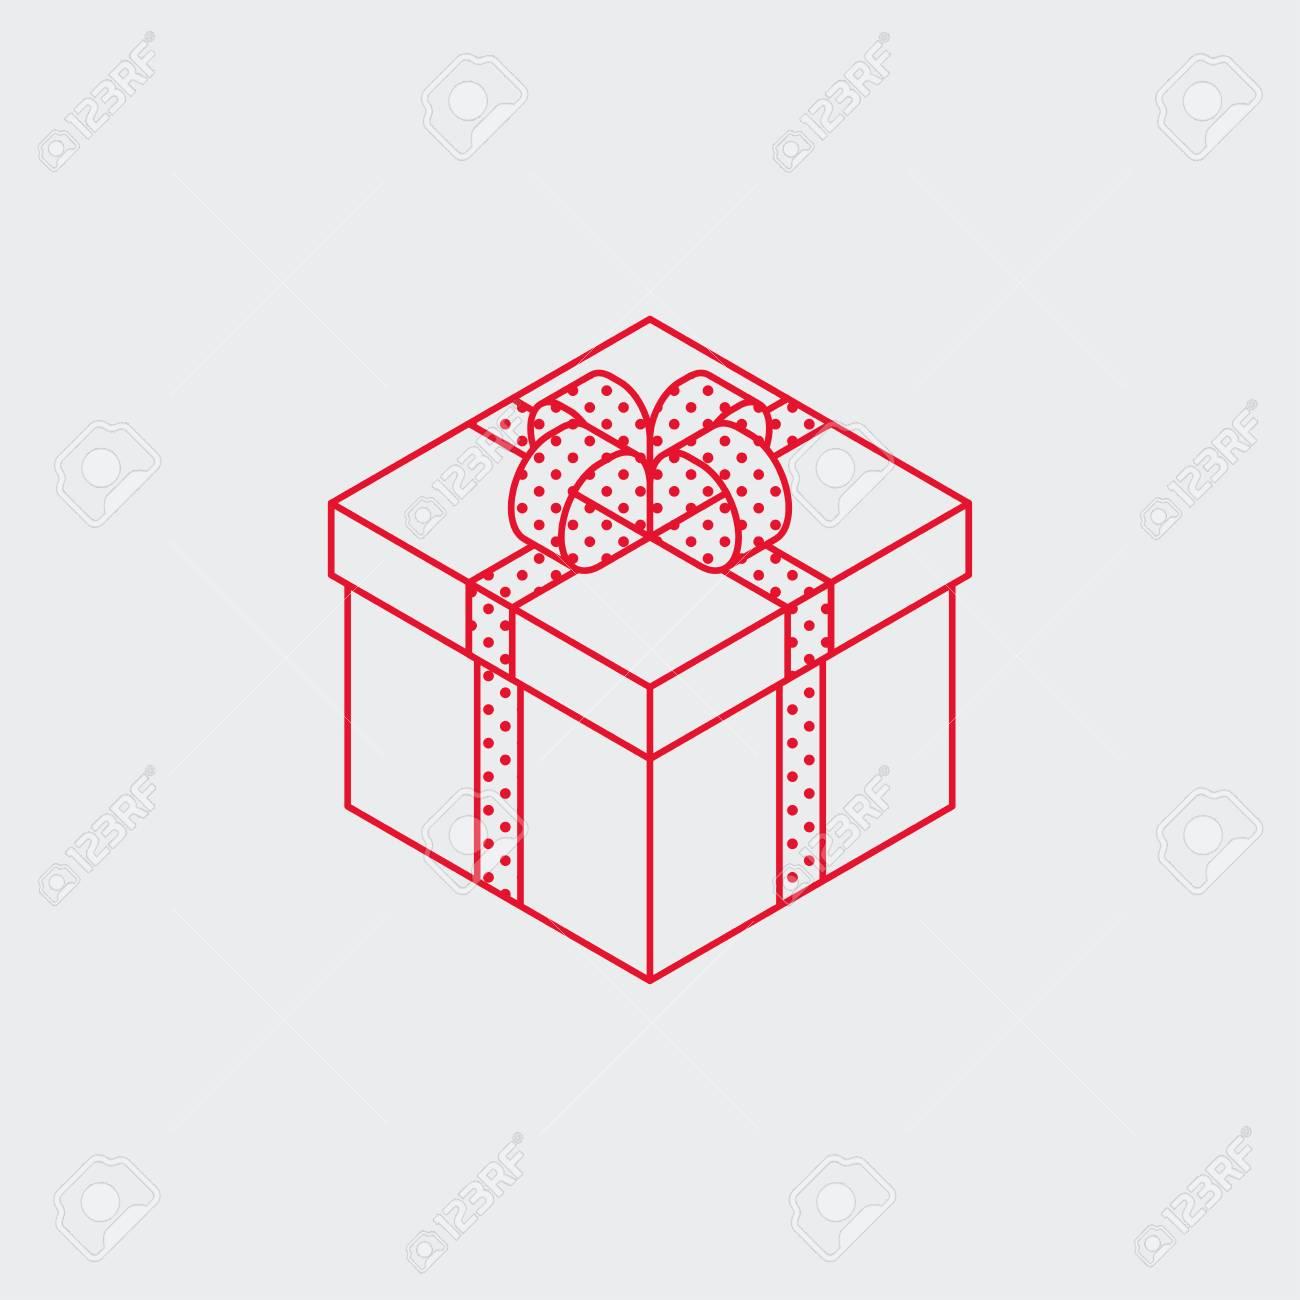 Isometric Vector Present Box Illustration Christmas Or Birthday